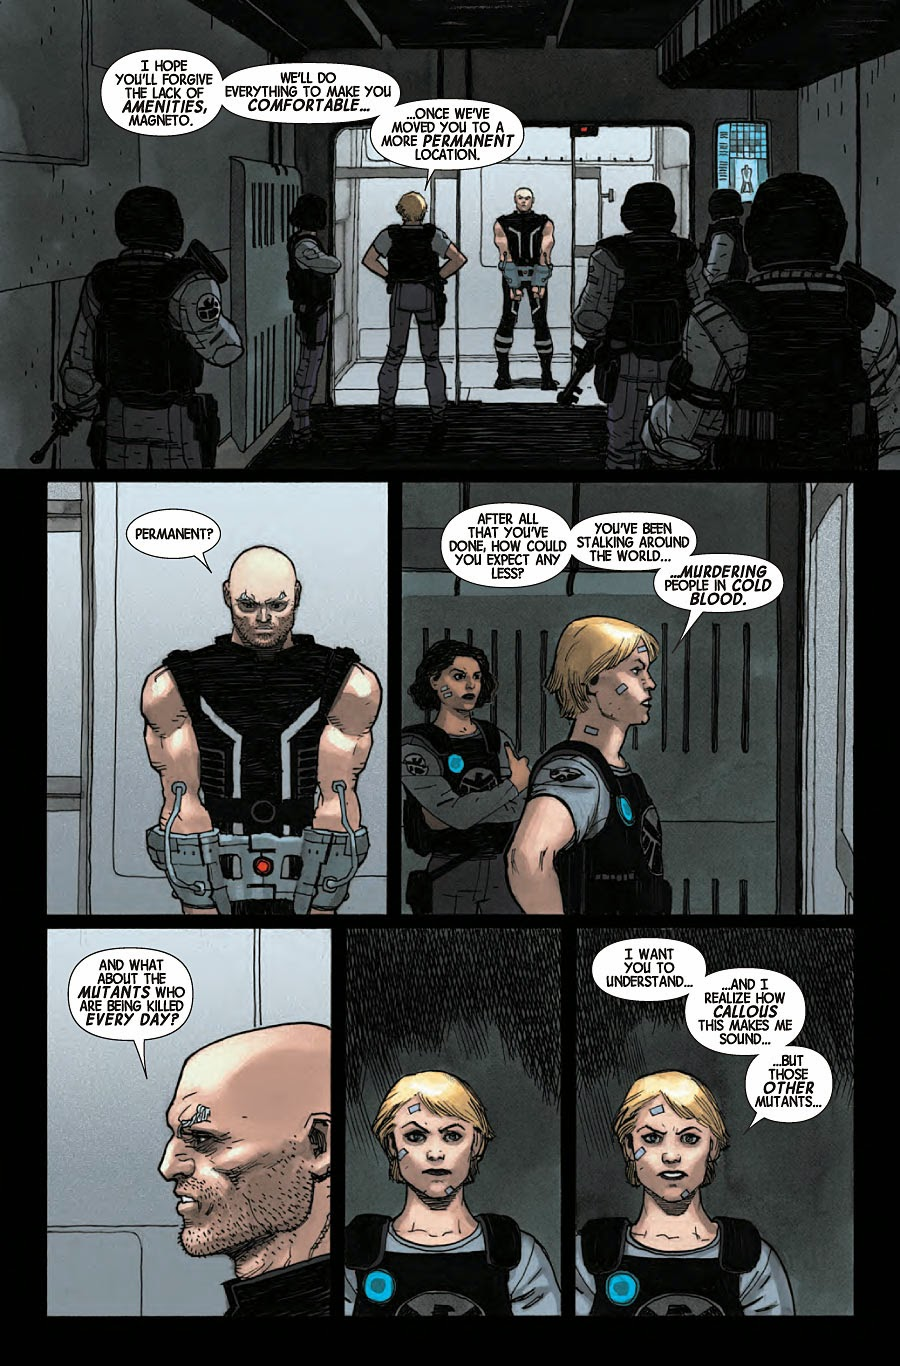 Agent Haines interrogates Magneto